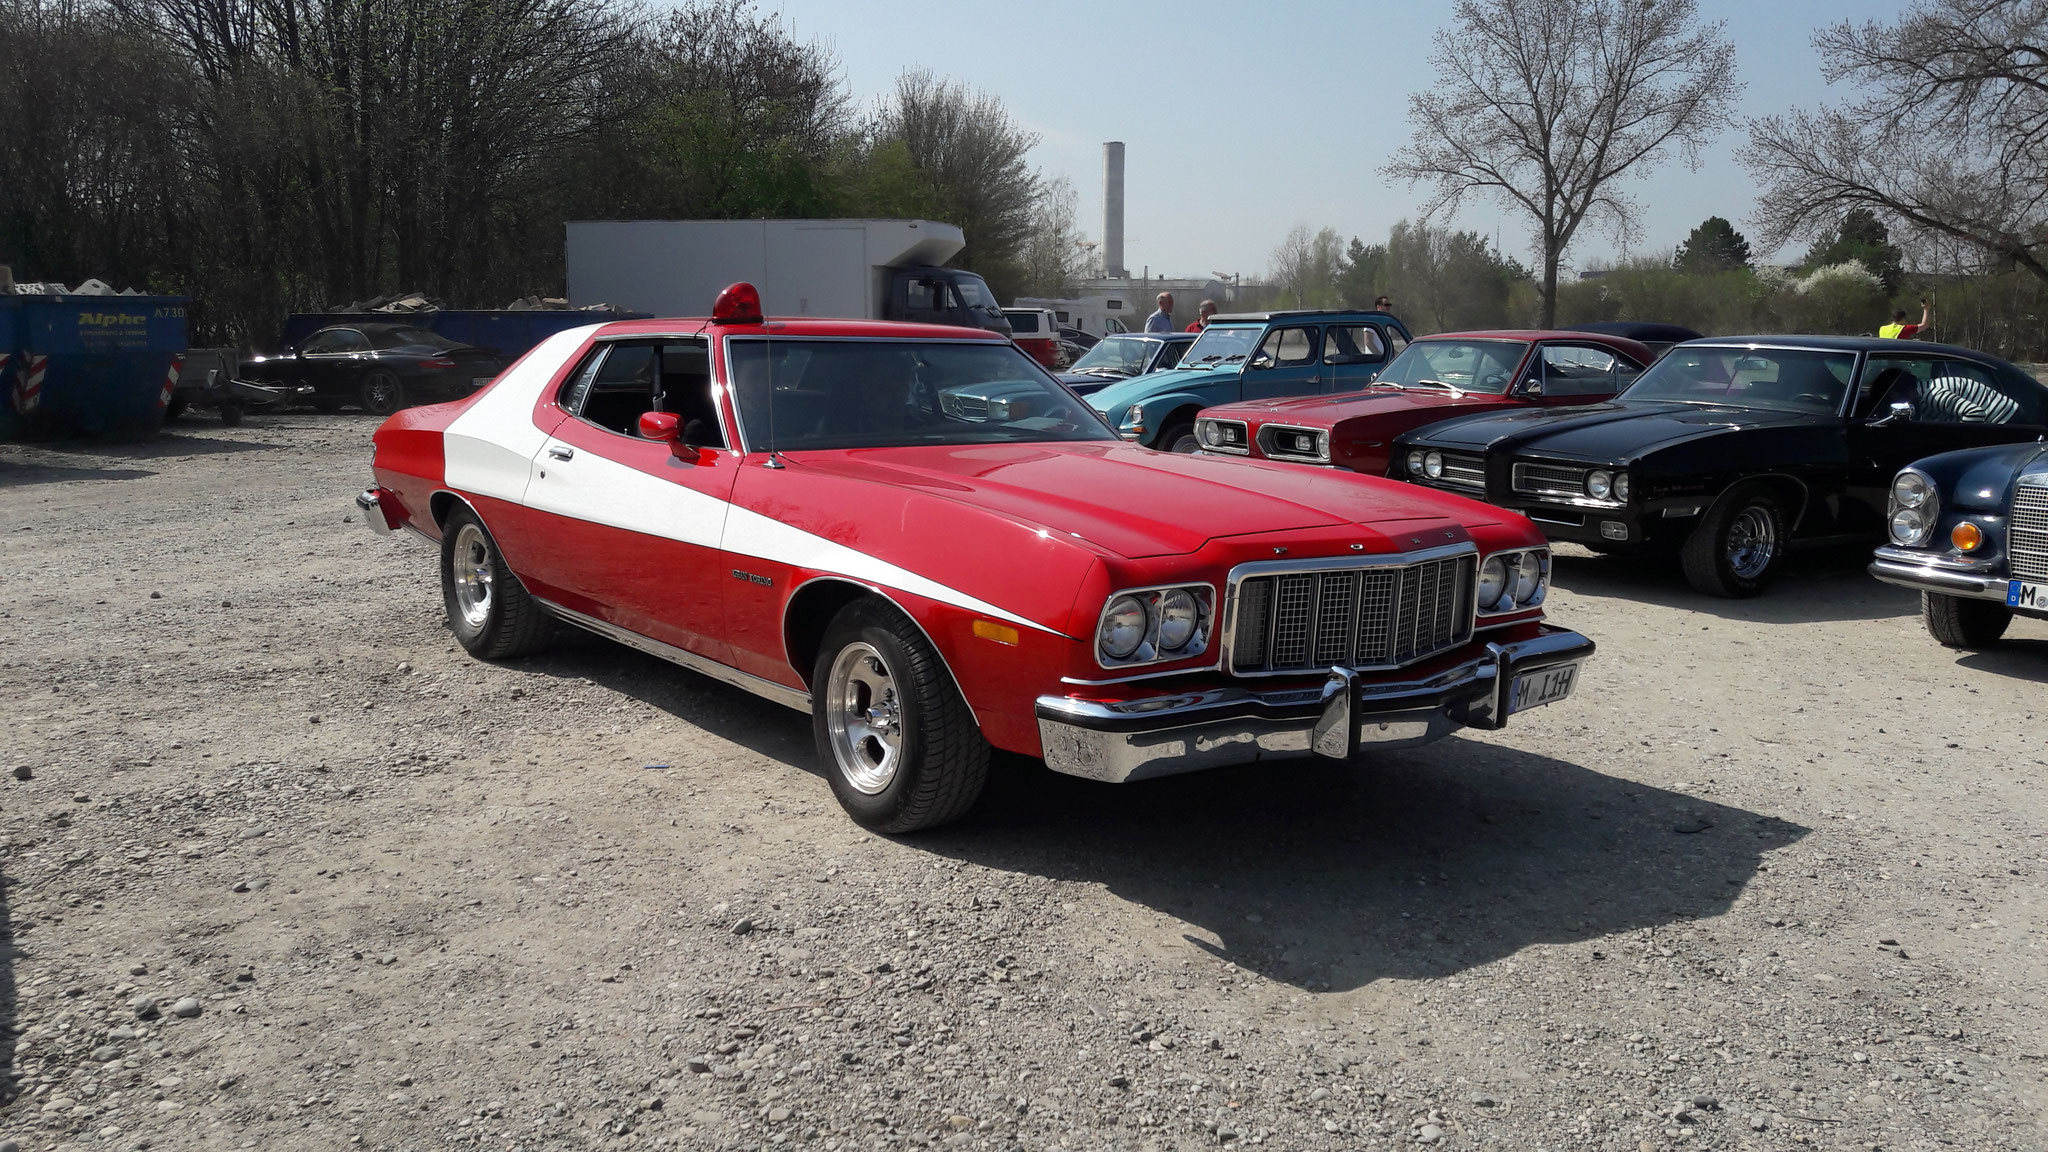 Ford Gran Torino (Starsky and Hutch) - M-I-1H